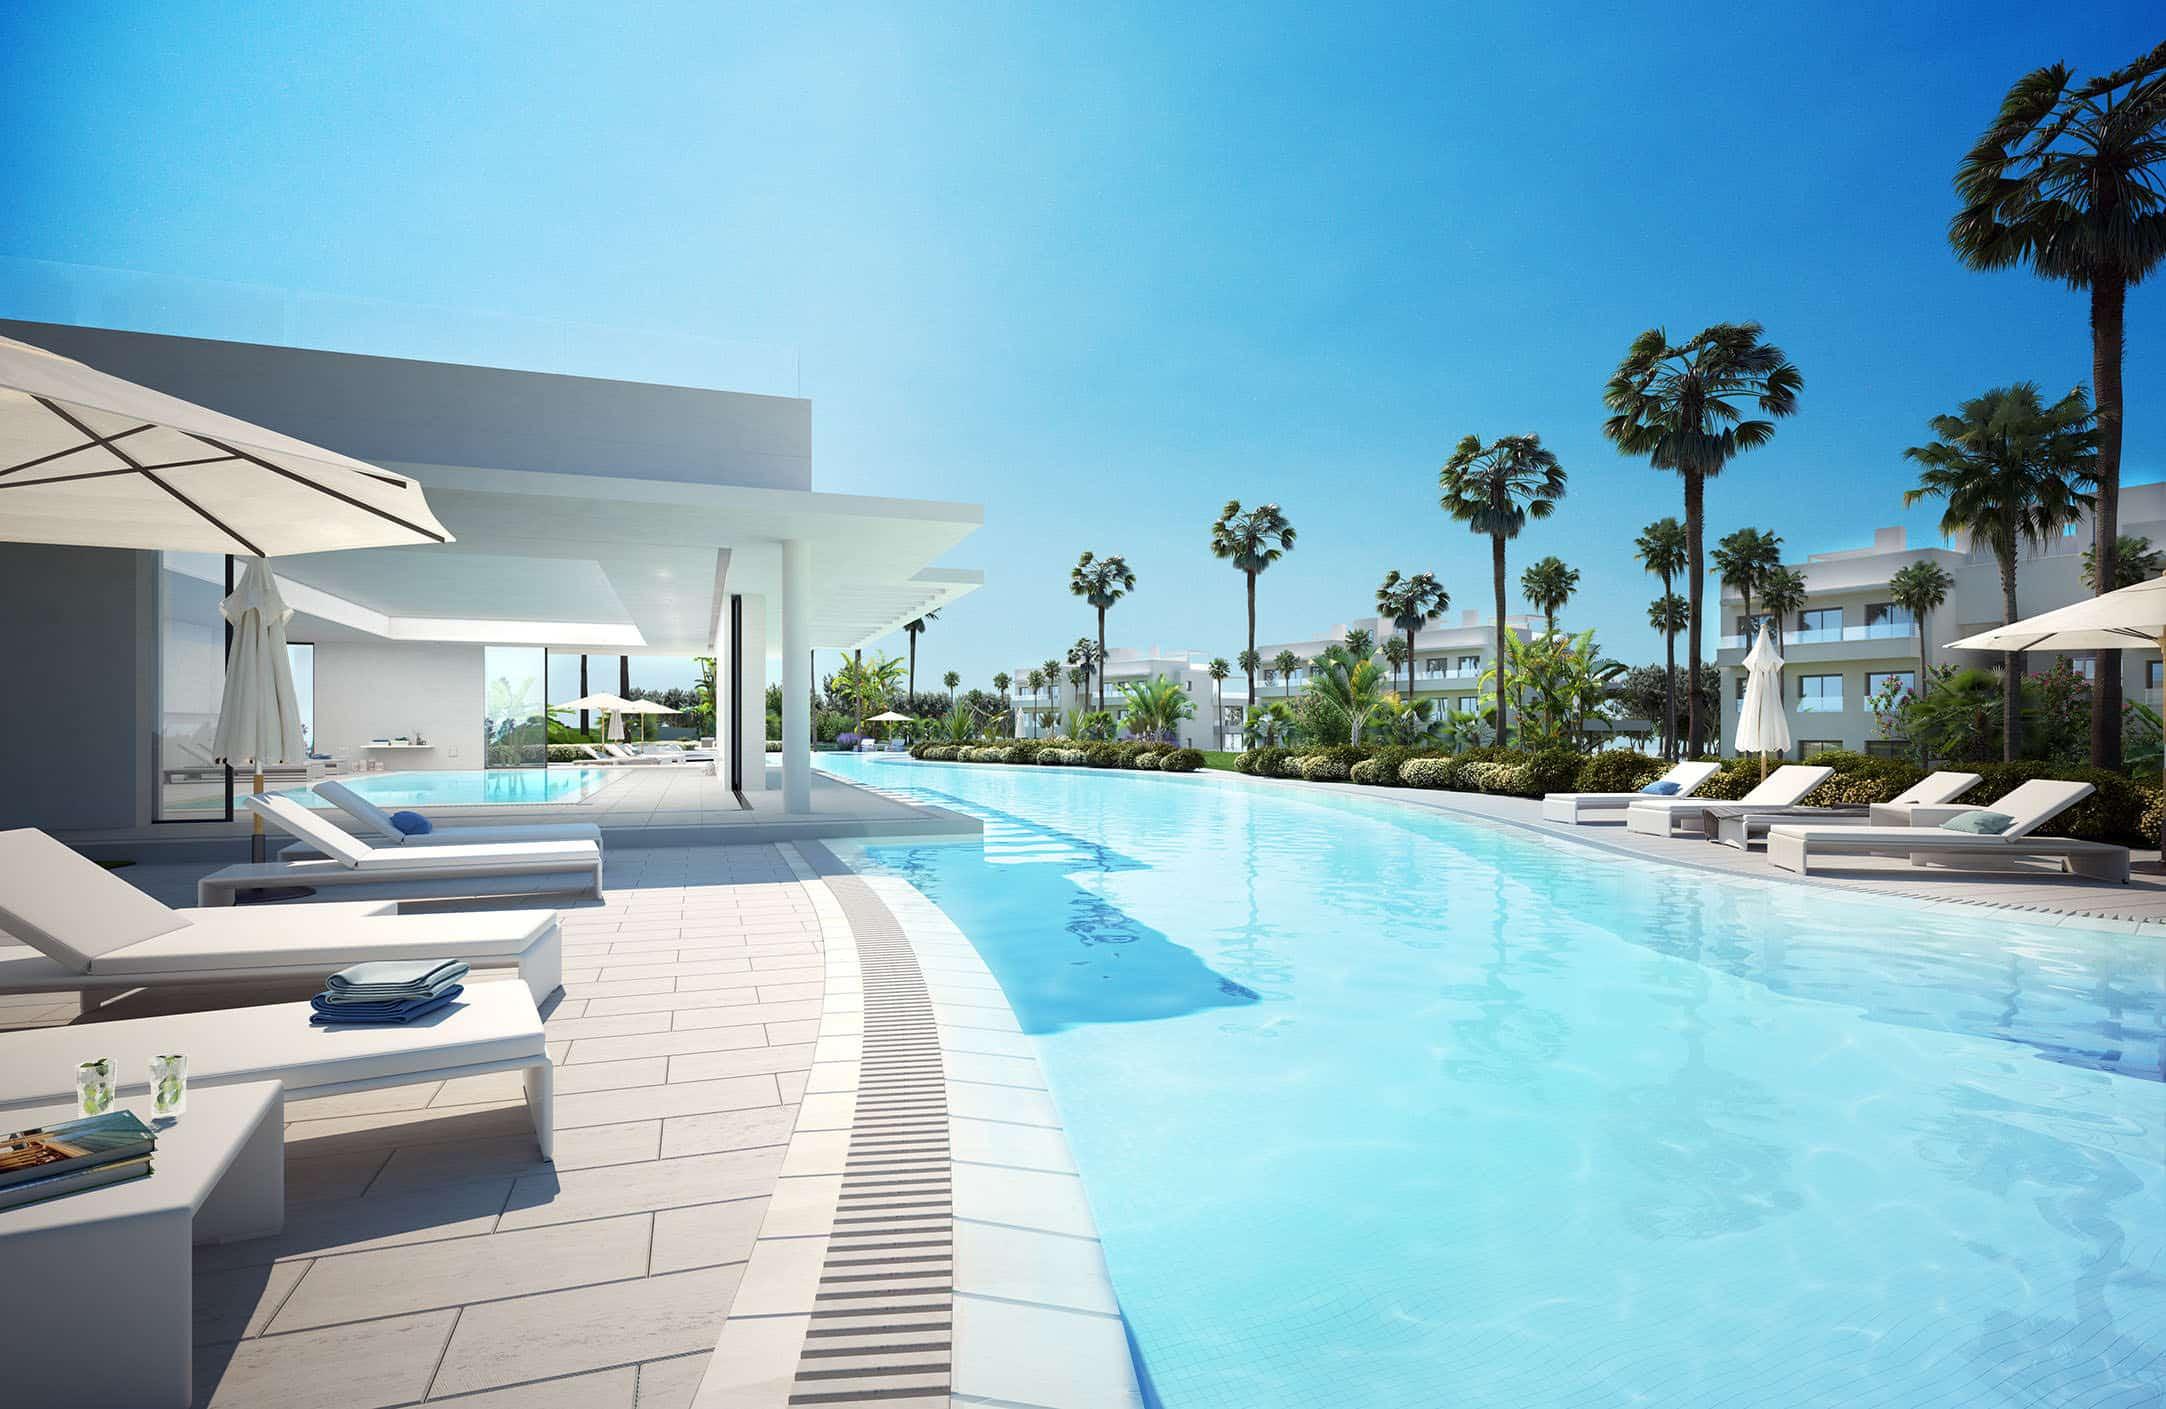 Cataleya fase 3 nieuwbouw modern appartement te koop in atalaya estepona realista - Modern appartement modern appartement ...